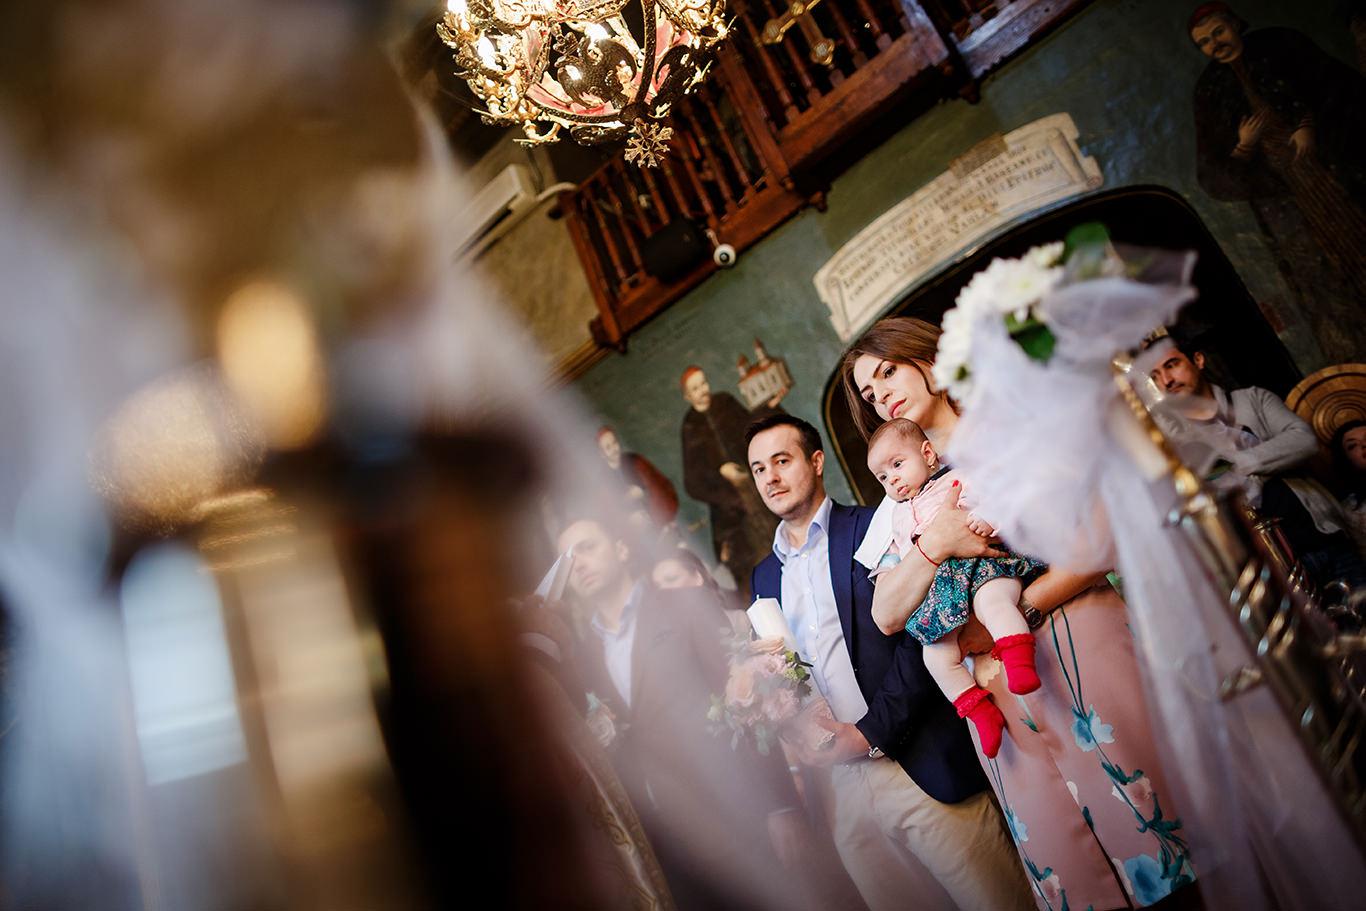 Ruxi si nasii la botez la biserica Gradina Icoanei